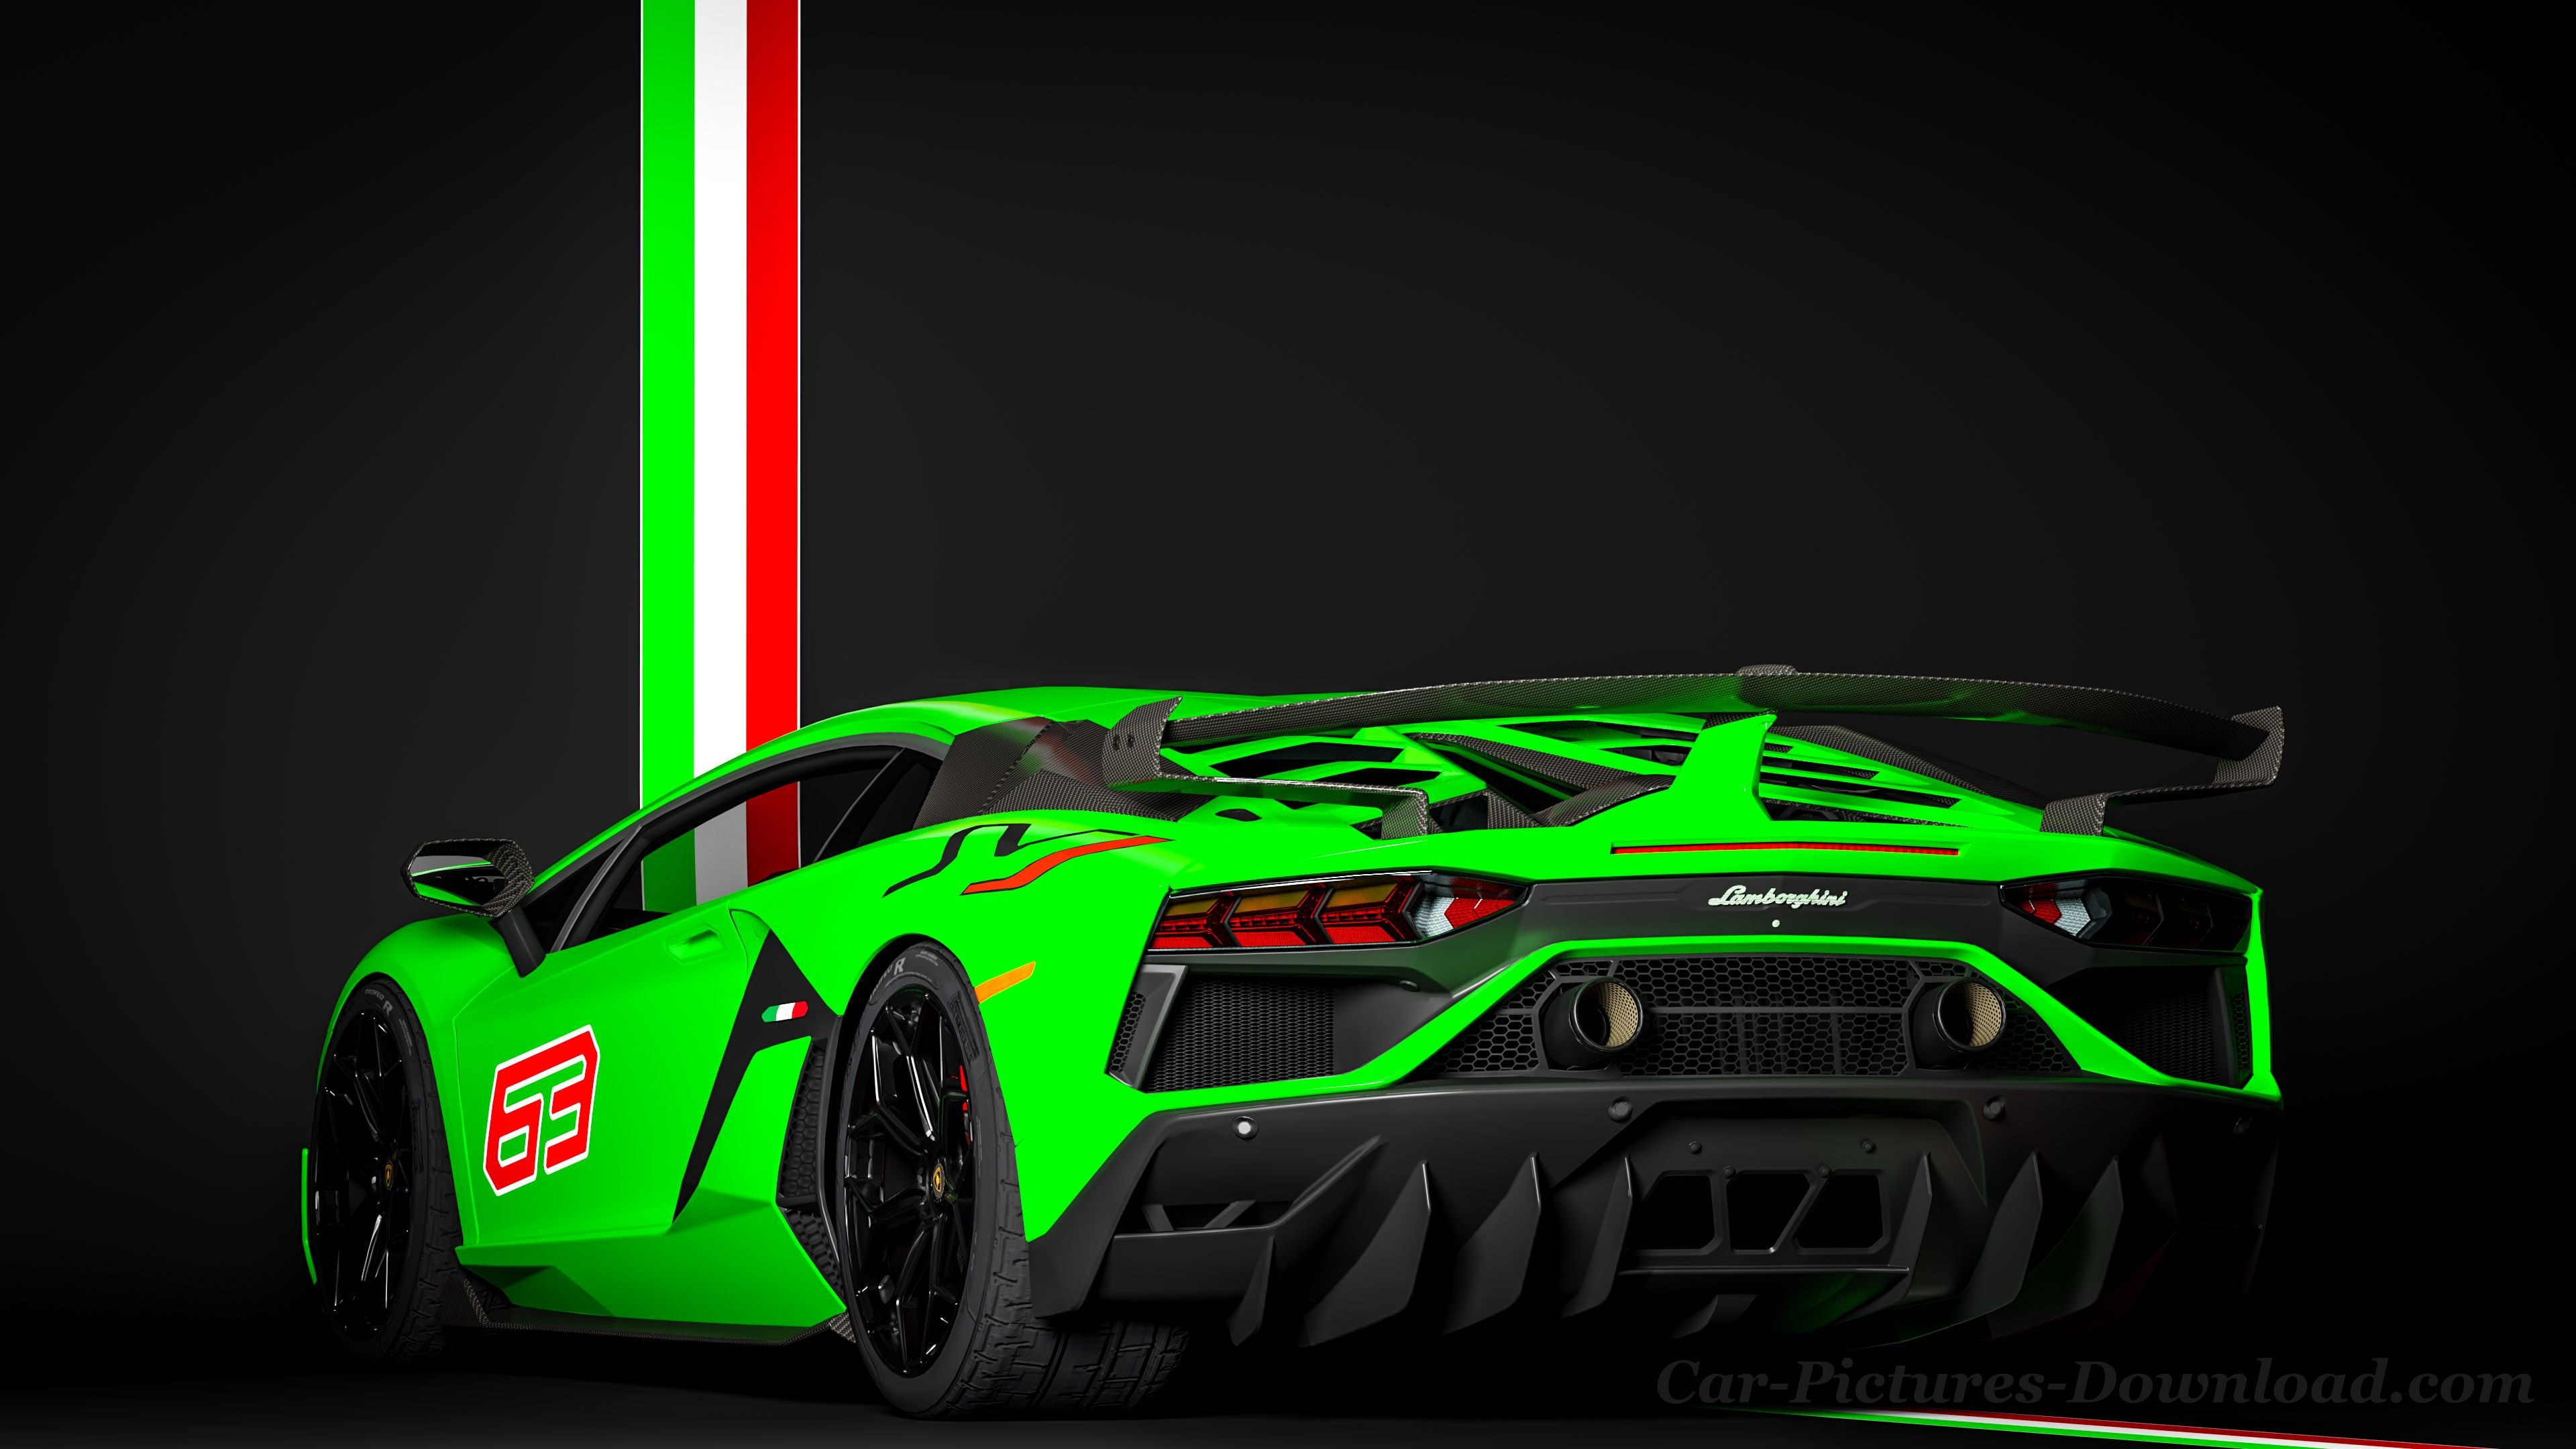 Lamborghini Green Car Hd 4k Wallpapers Wallpaper Cave